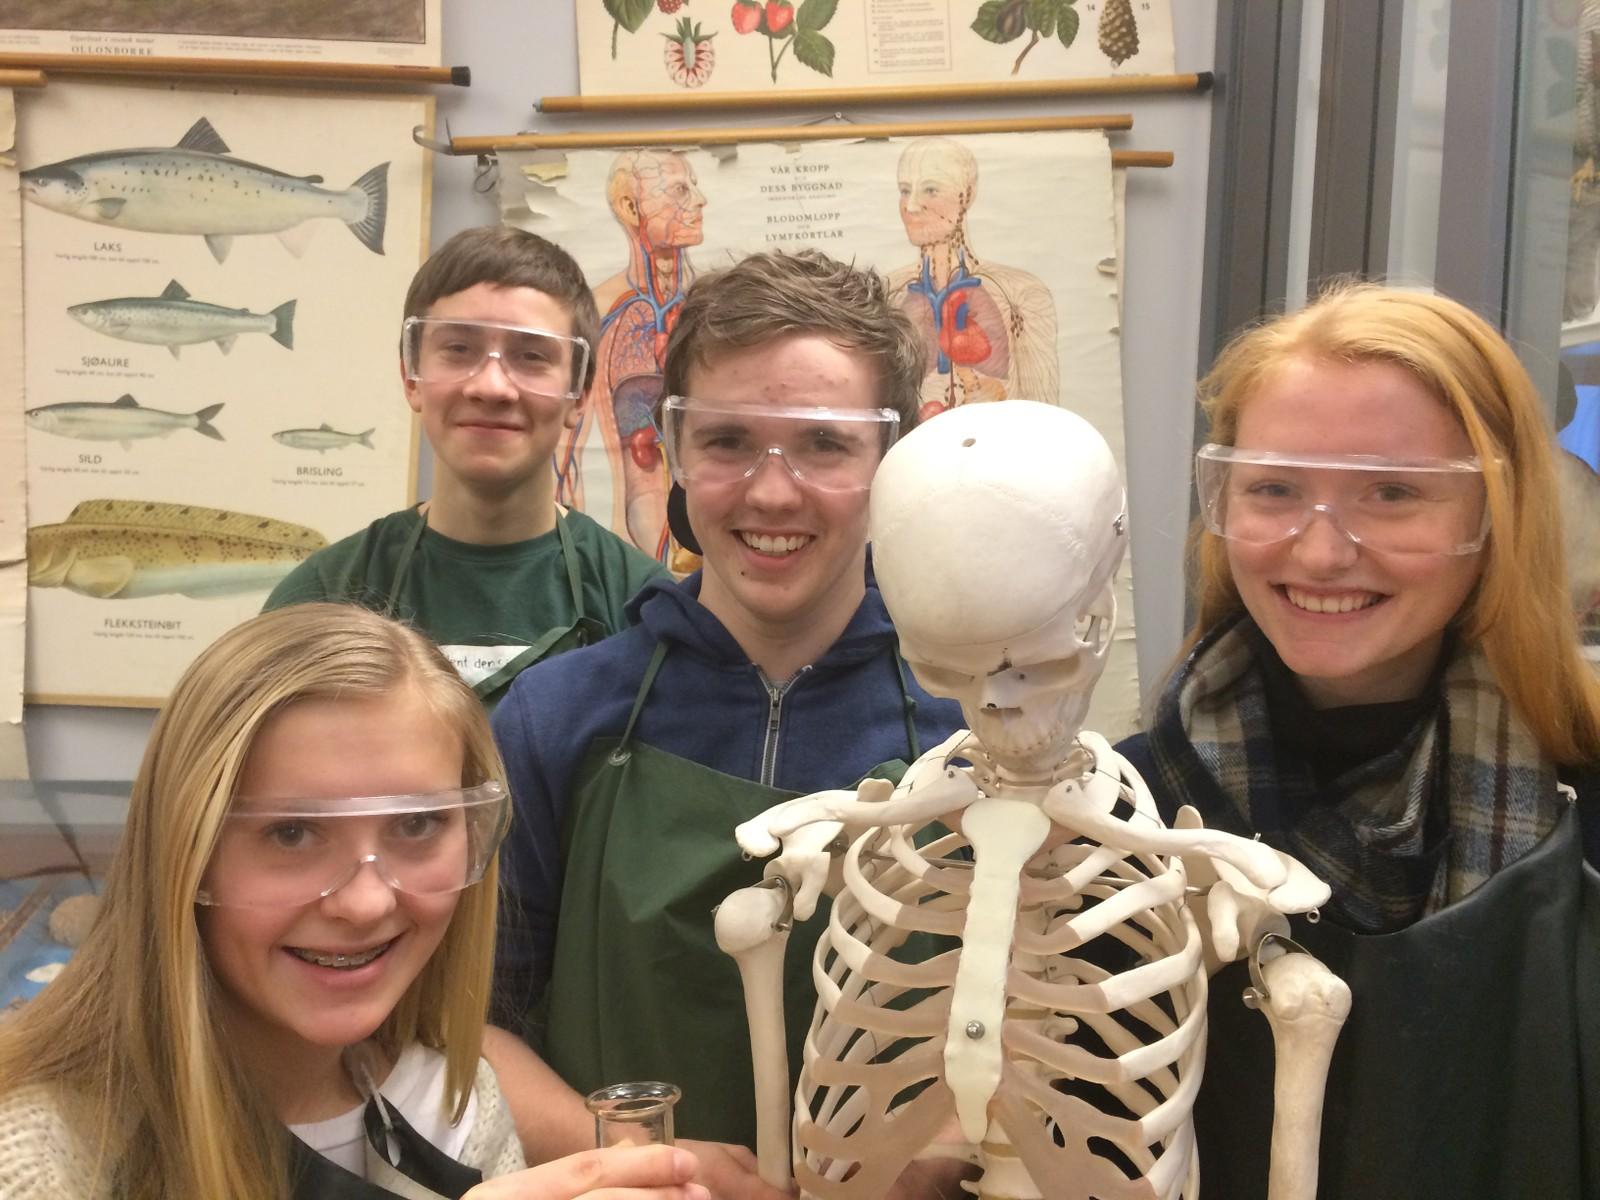 Sondre Wold, Guro Smitt-Amundsen Wimmer, Odd Martin Hofgård og Hermine Behrens Dyreng fra Elverum ungdomsskole fikk 8 poeng i Klassequizen.